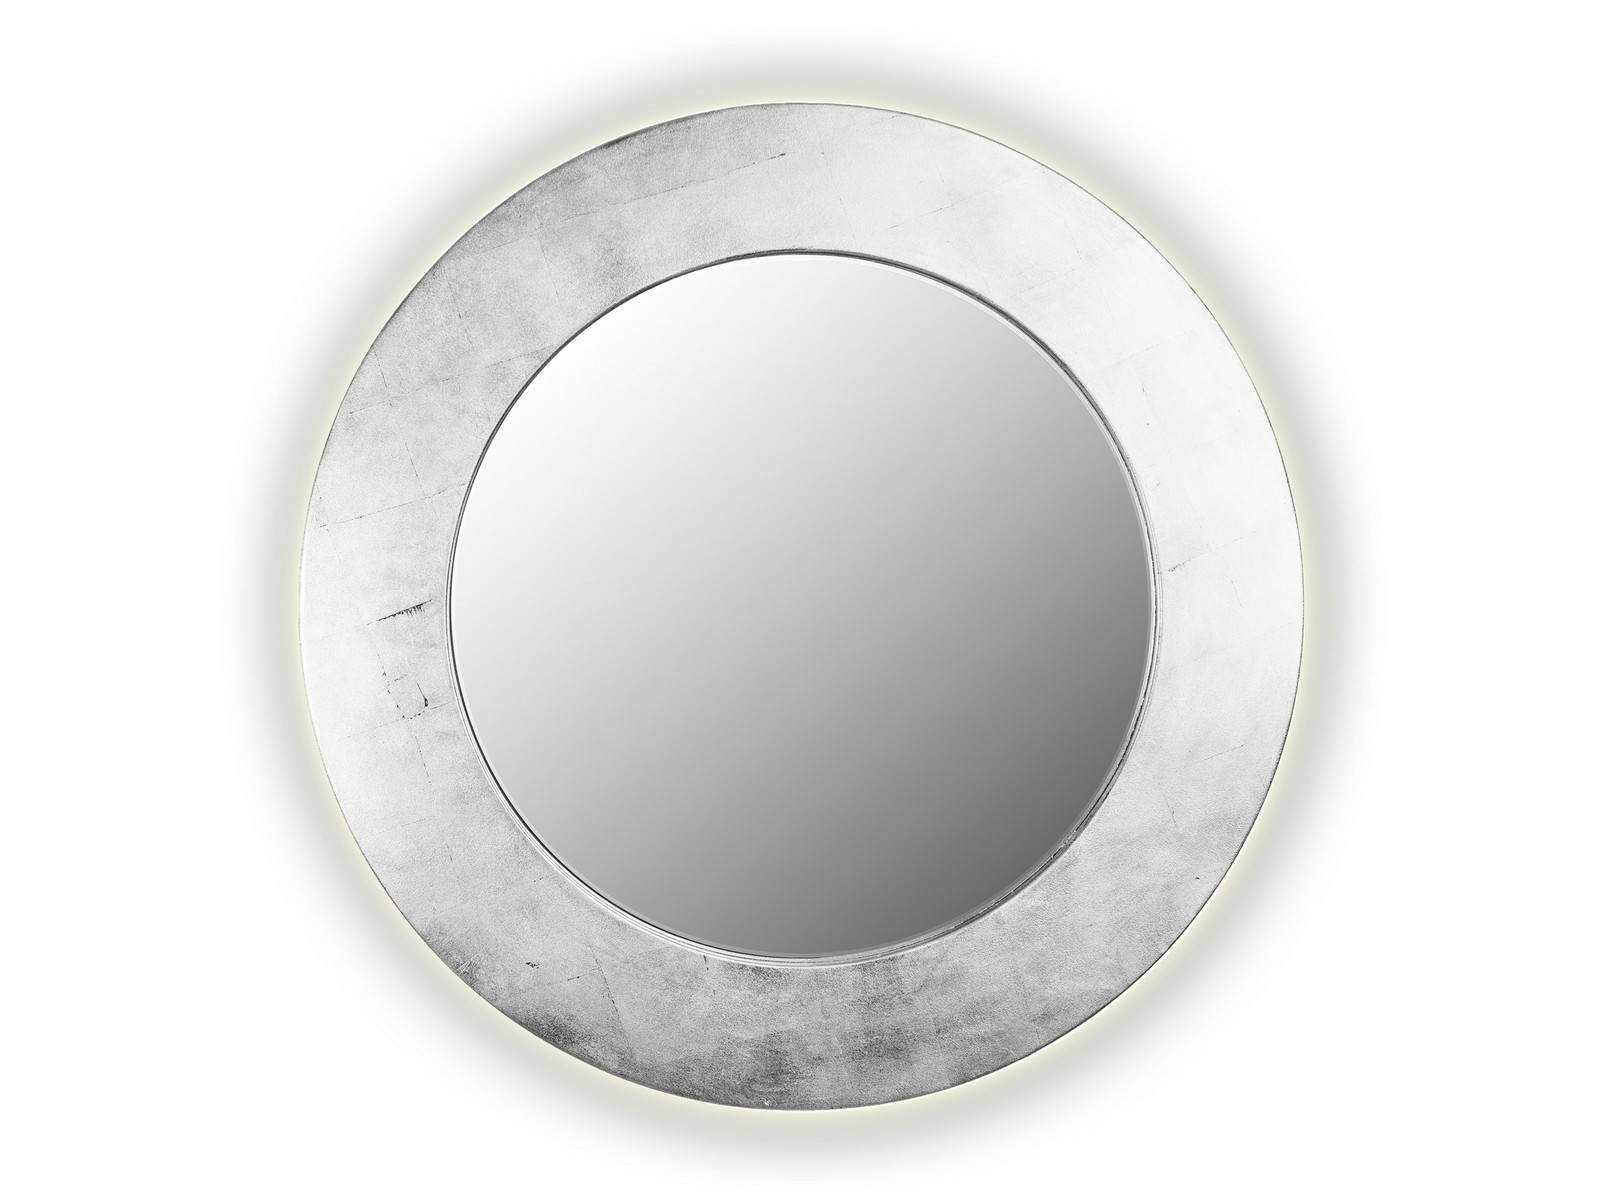 Зеркало PIECESНастенные зеркала<br>Данный вариант представлен в серебристом цвете.<br><br>kit: None<br>gender: None